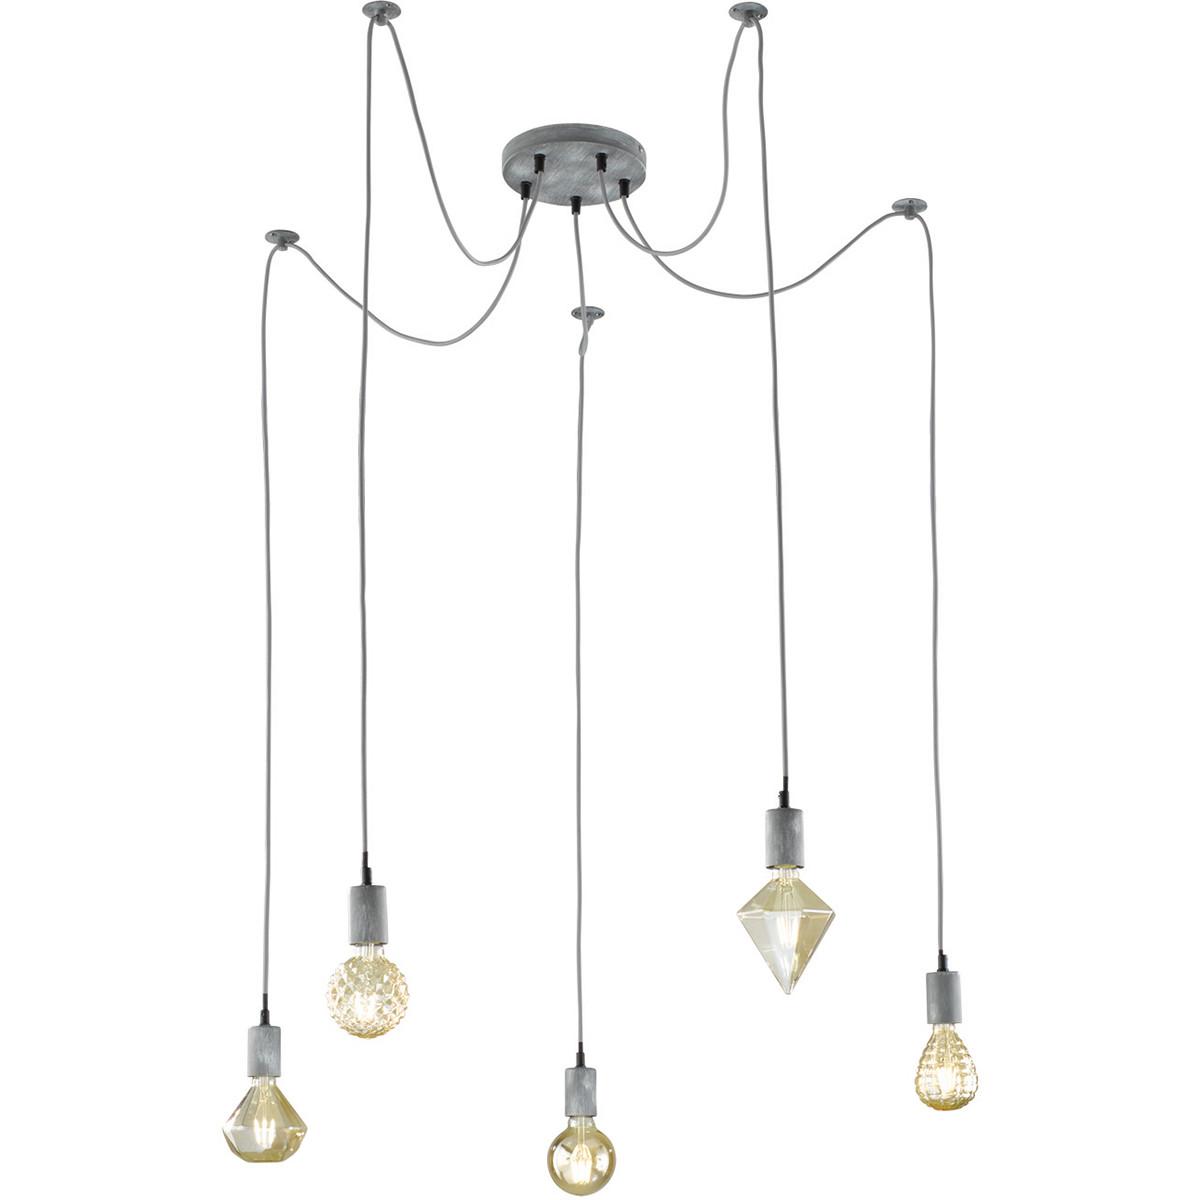 LED Hanglamp - Hangverlichting - Trion Cardino - E27 Fitting - 5-lichts - Rond - Antiek Grijs - Alum